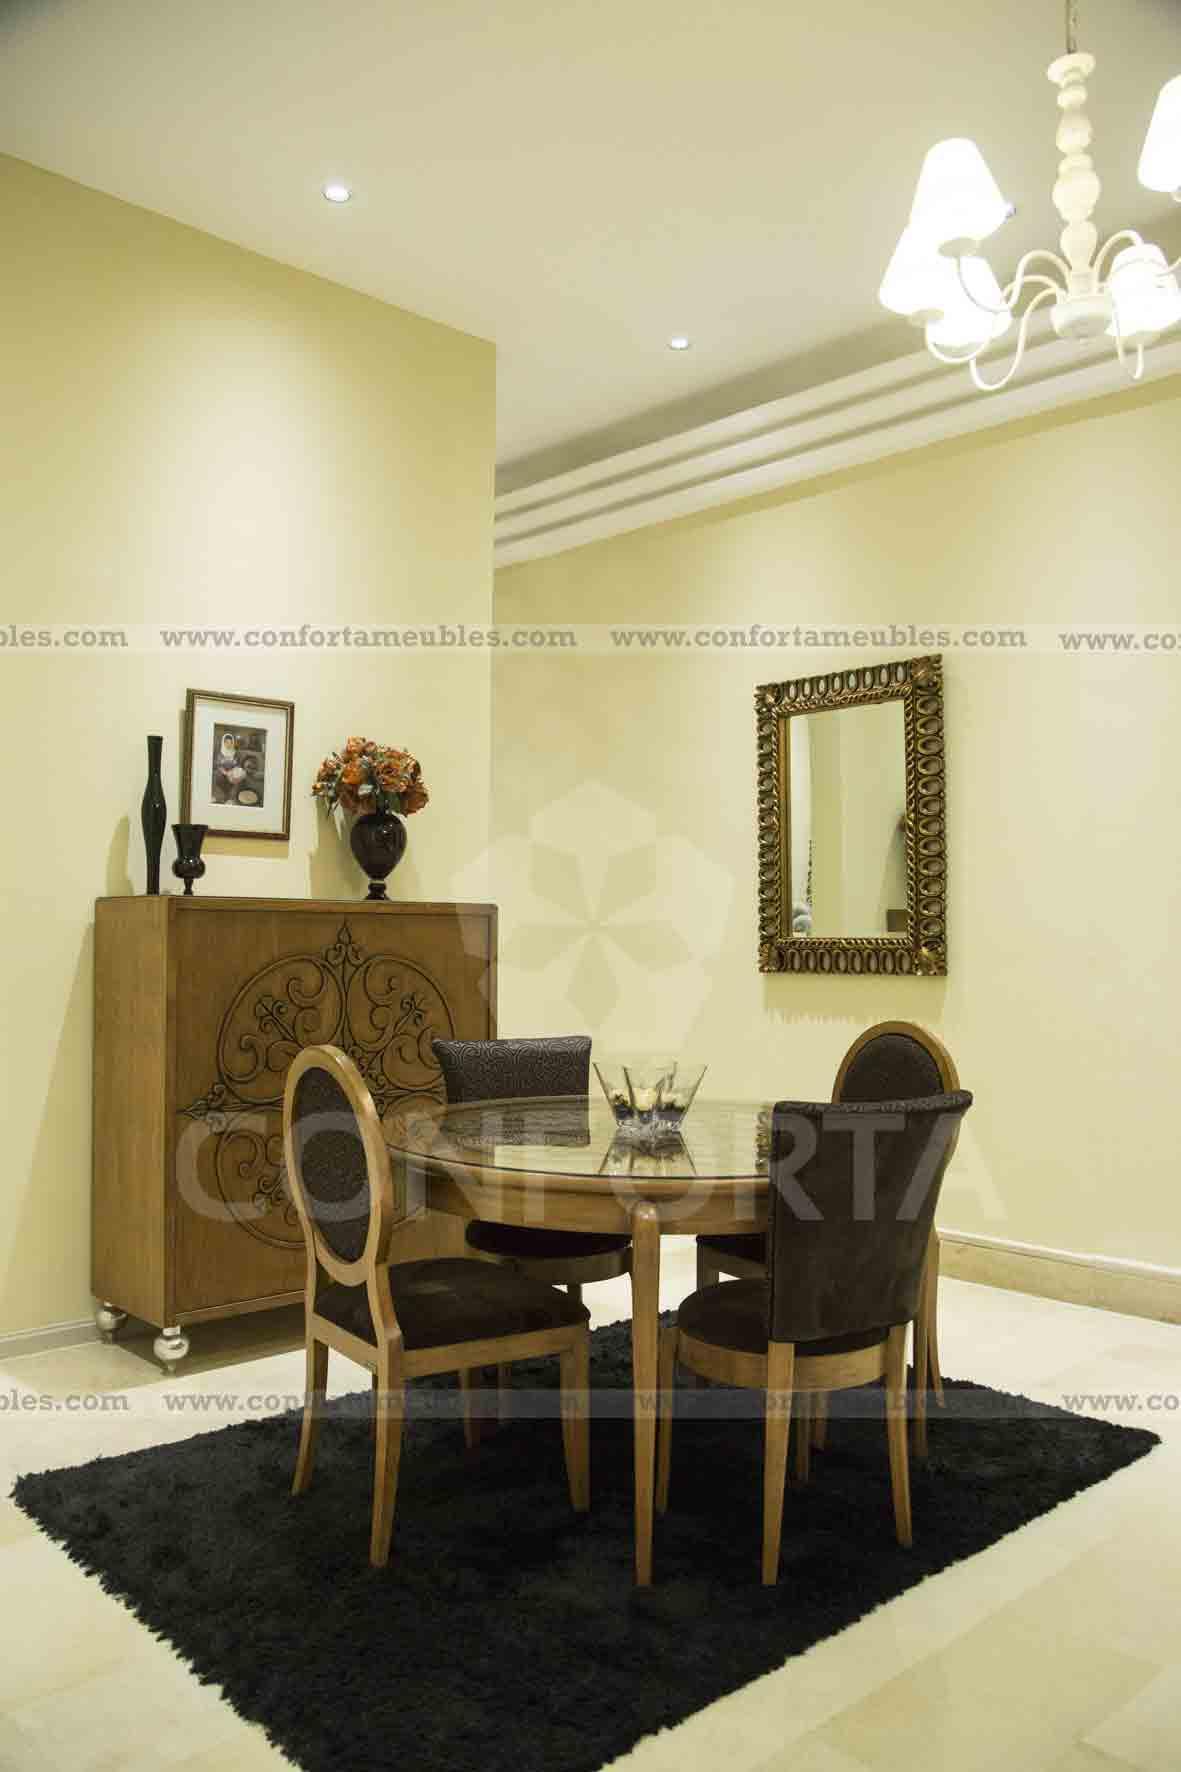 salles manger tunisie meubles et d coration tunisie. Black Bedroom Furniture Sets. Home Design Ideas